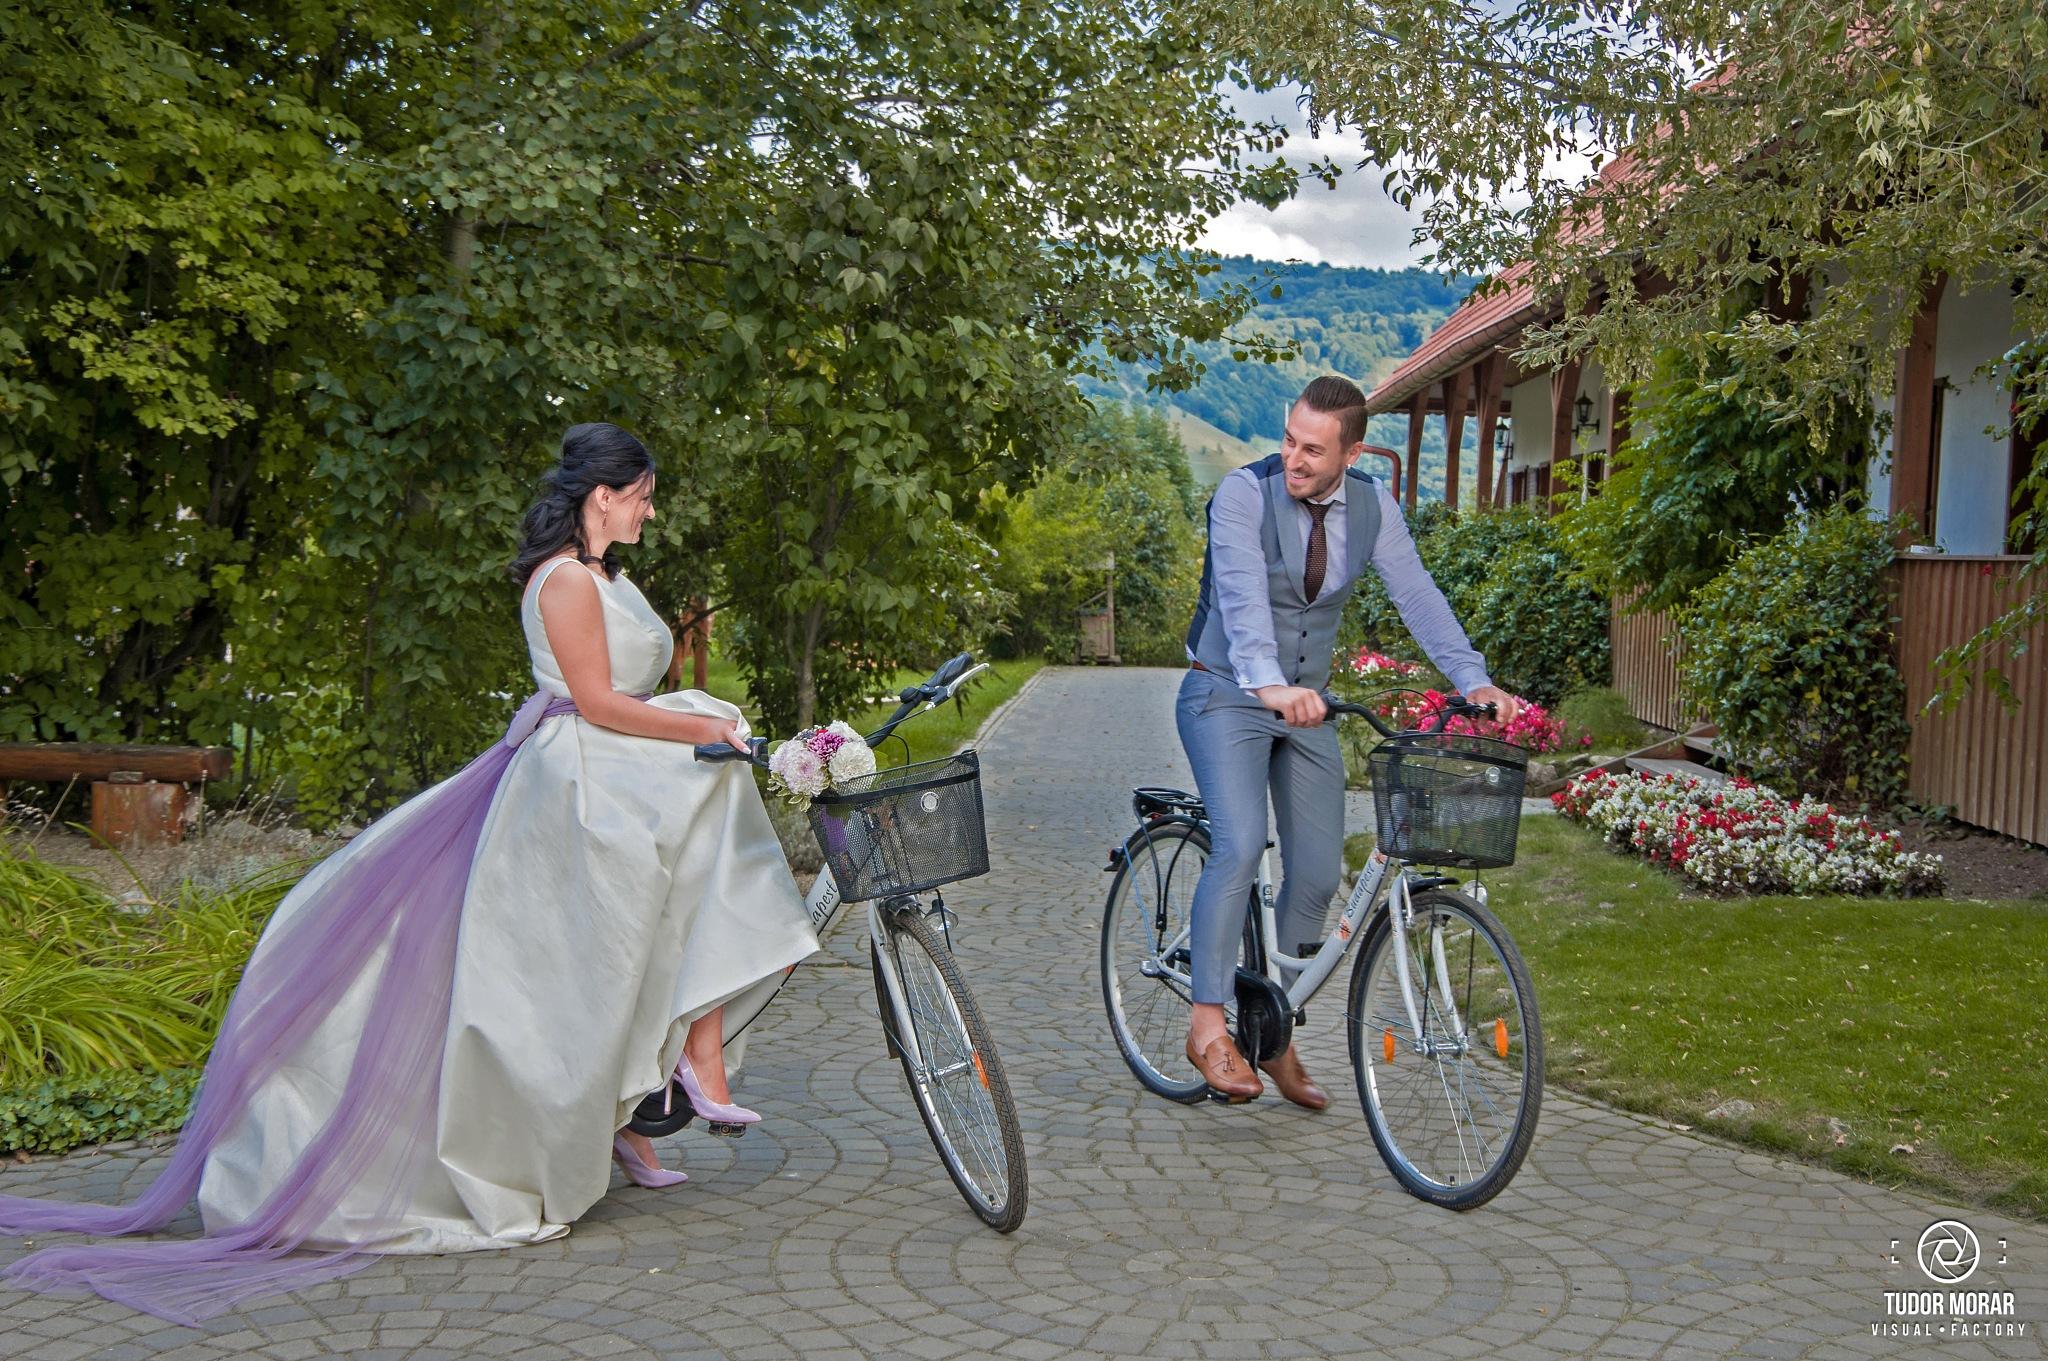 Ionut & Alina @ Conacul Secuiesc, Coltesti, cycling :) by Tudor Morar Visual Factory